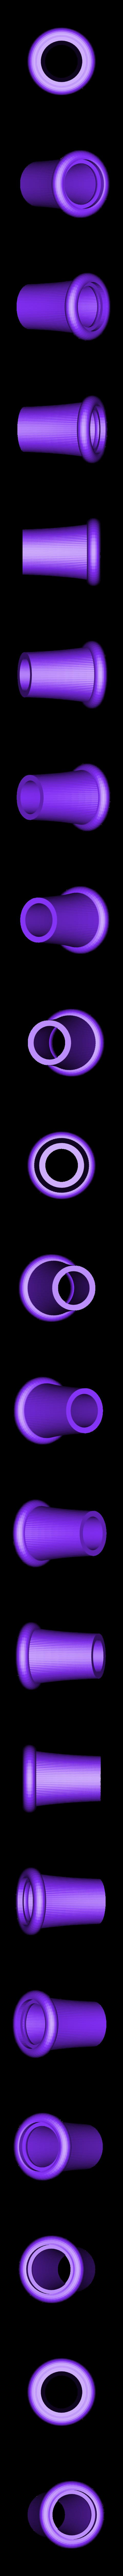 Trunk_C.stl Download free STL file Chandelier Iris • 3D printer design, Opossums